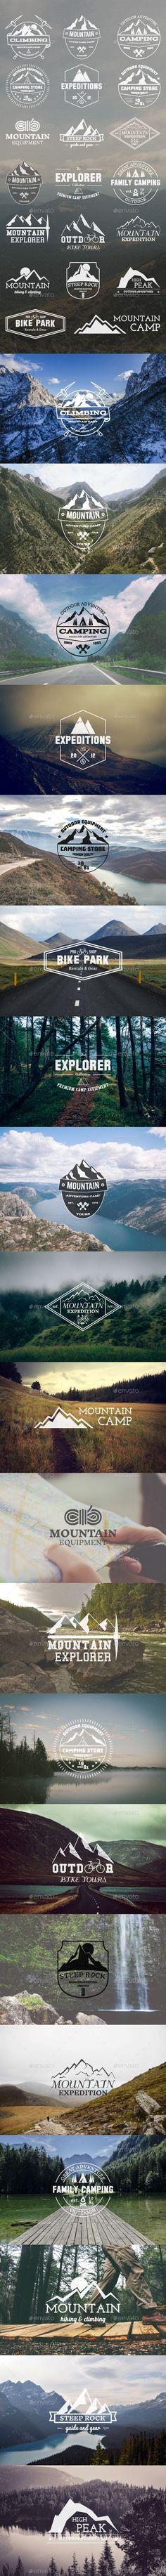 20 Adventure Badges & Logo - Badges & Stickers Web Elements